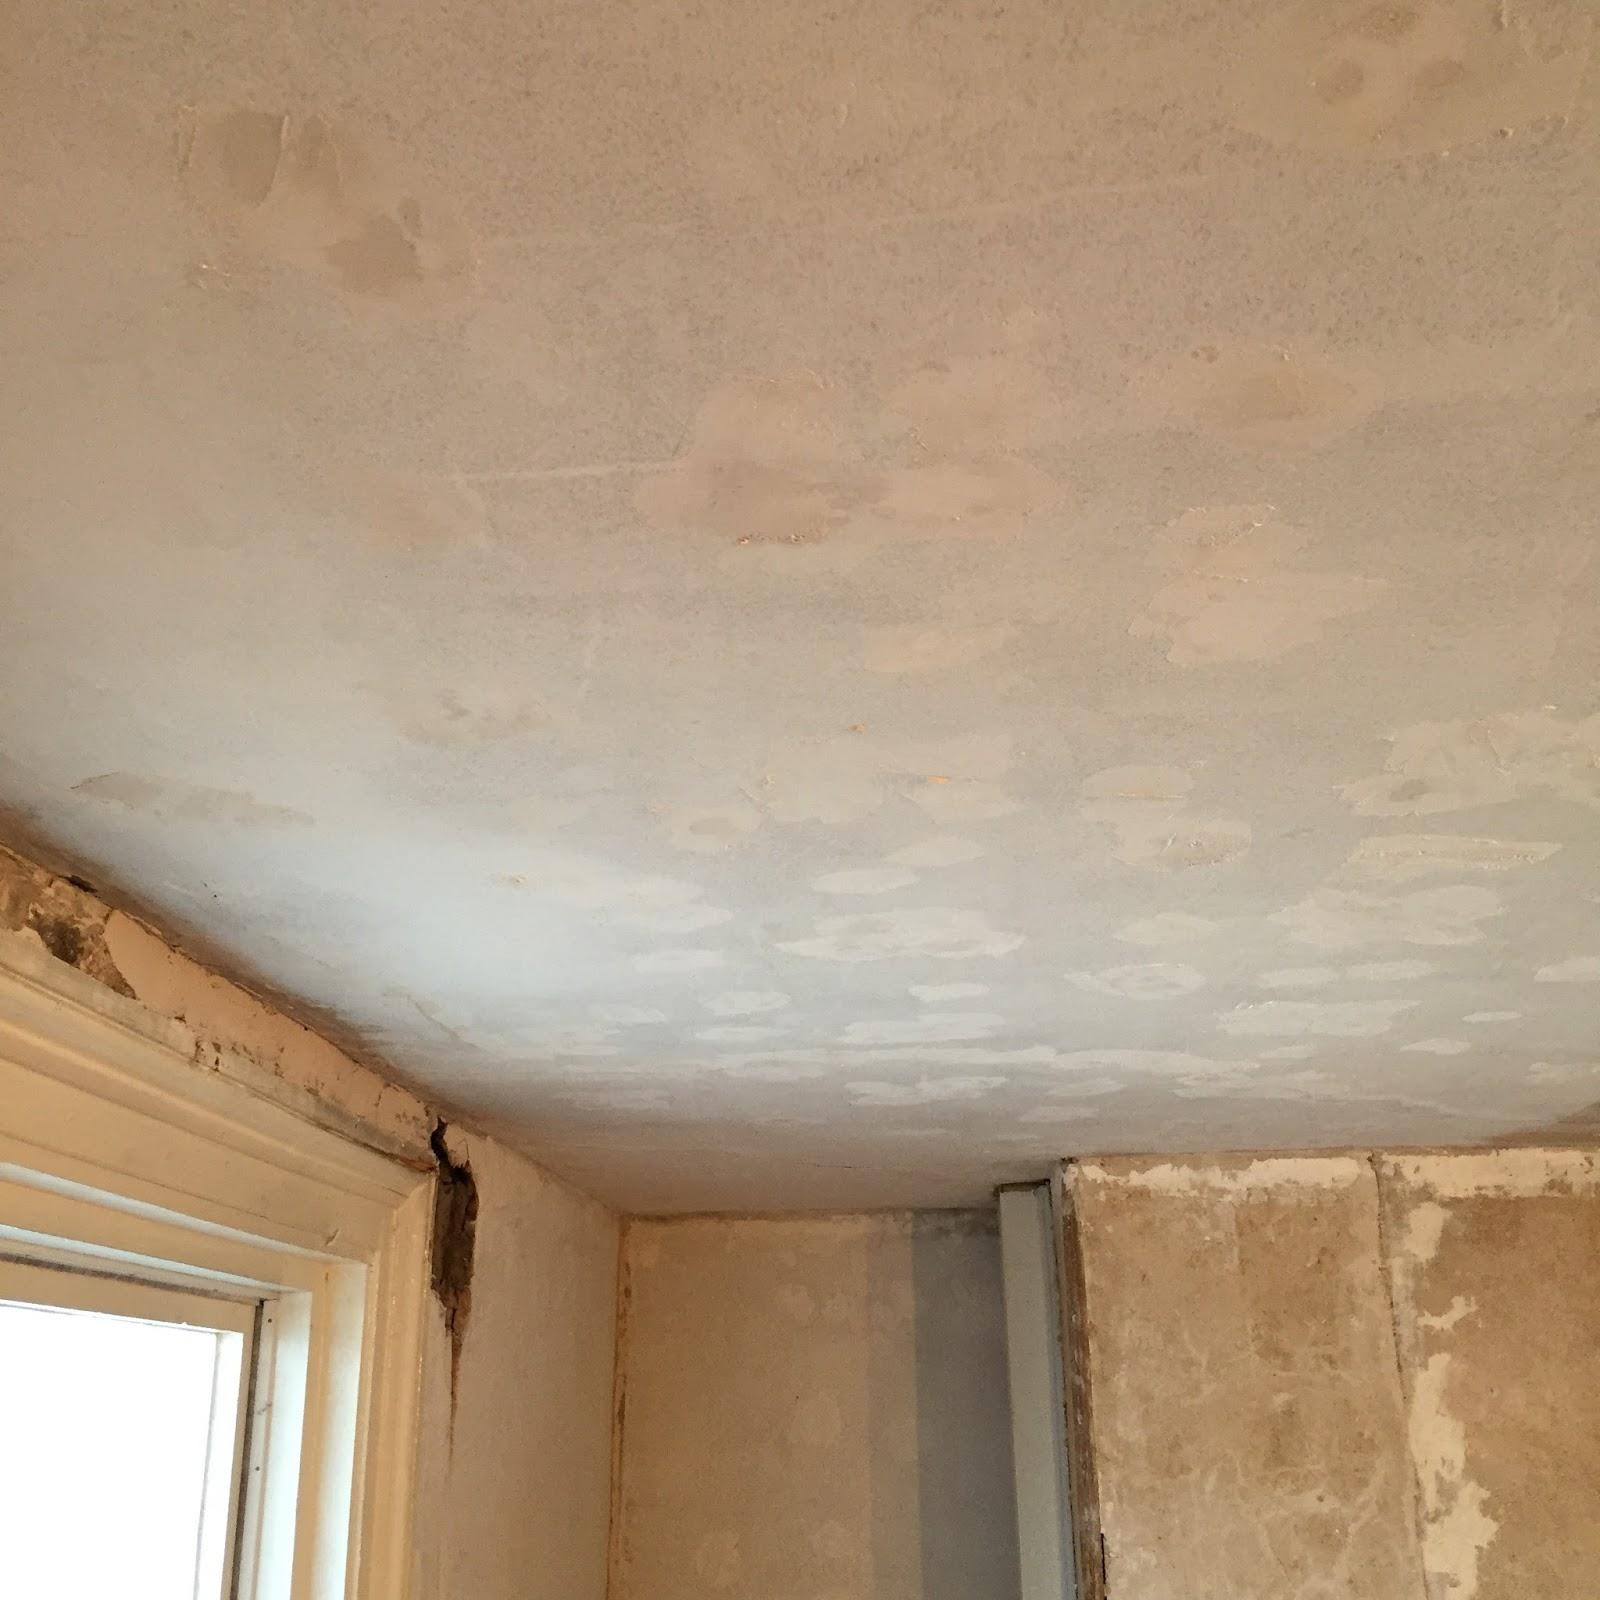 Polystyrene ceiling tiles illegal lightneasy polystyrene ceiling tiles illegal columbialabels info dailygadgetfo Gallery